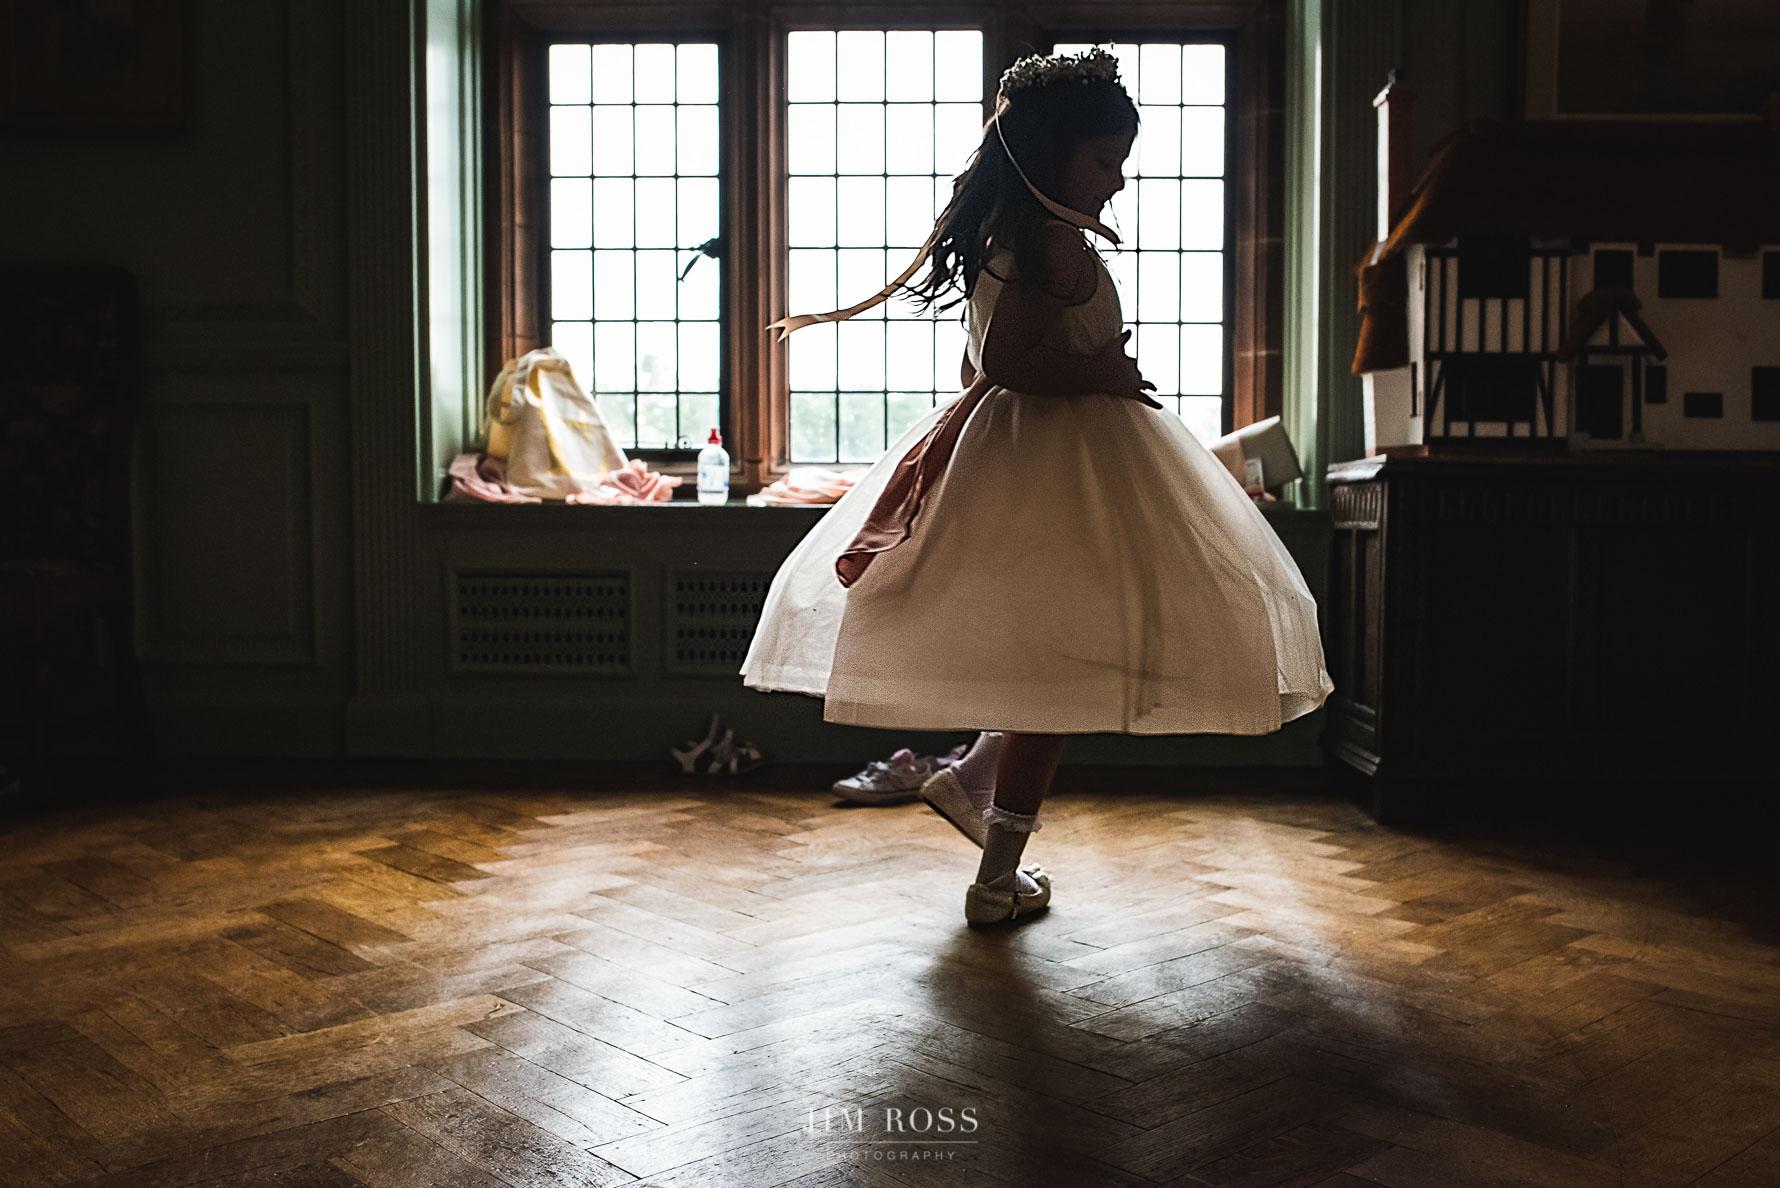 Flower girl dancing in window light